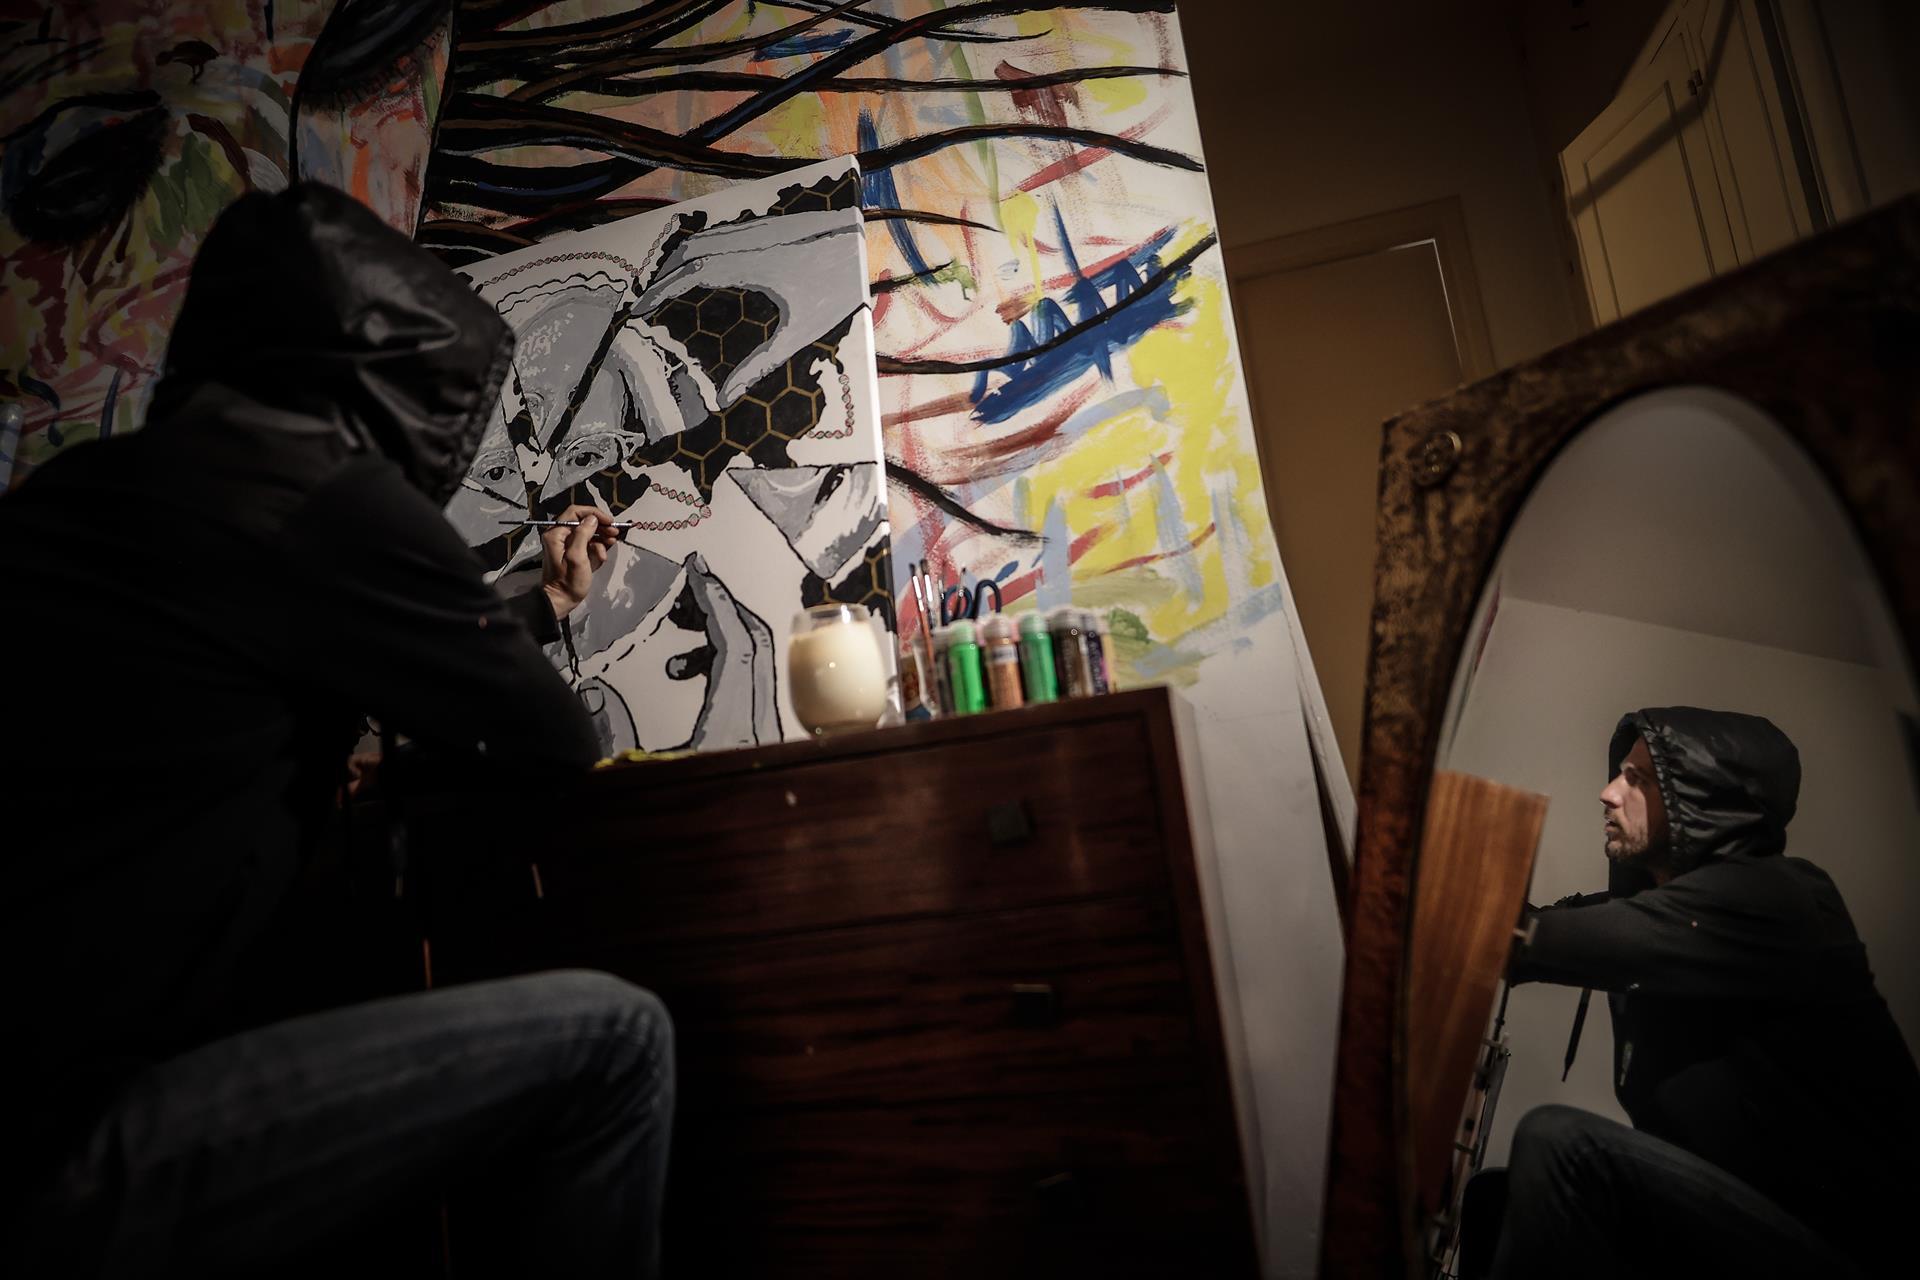 Criptoartista argentino pinta a famosos y dona sus ganancias a beneficencia